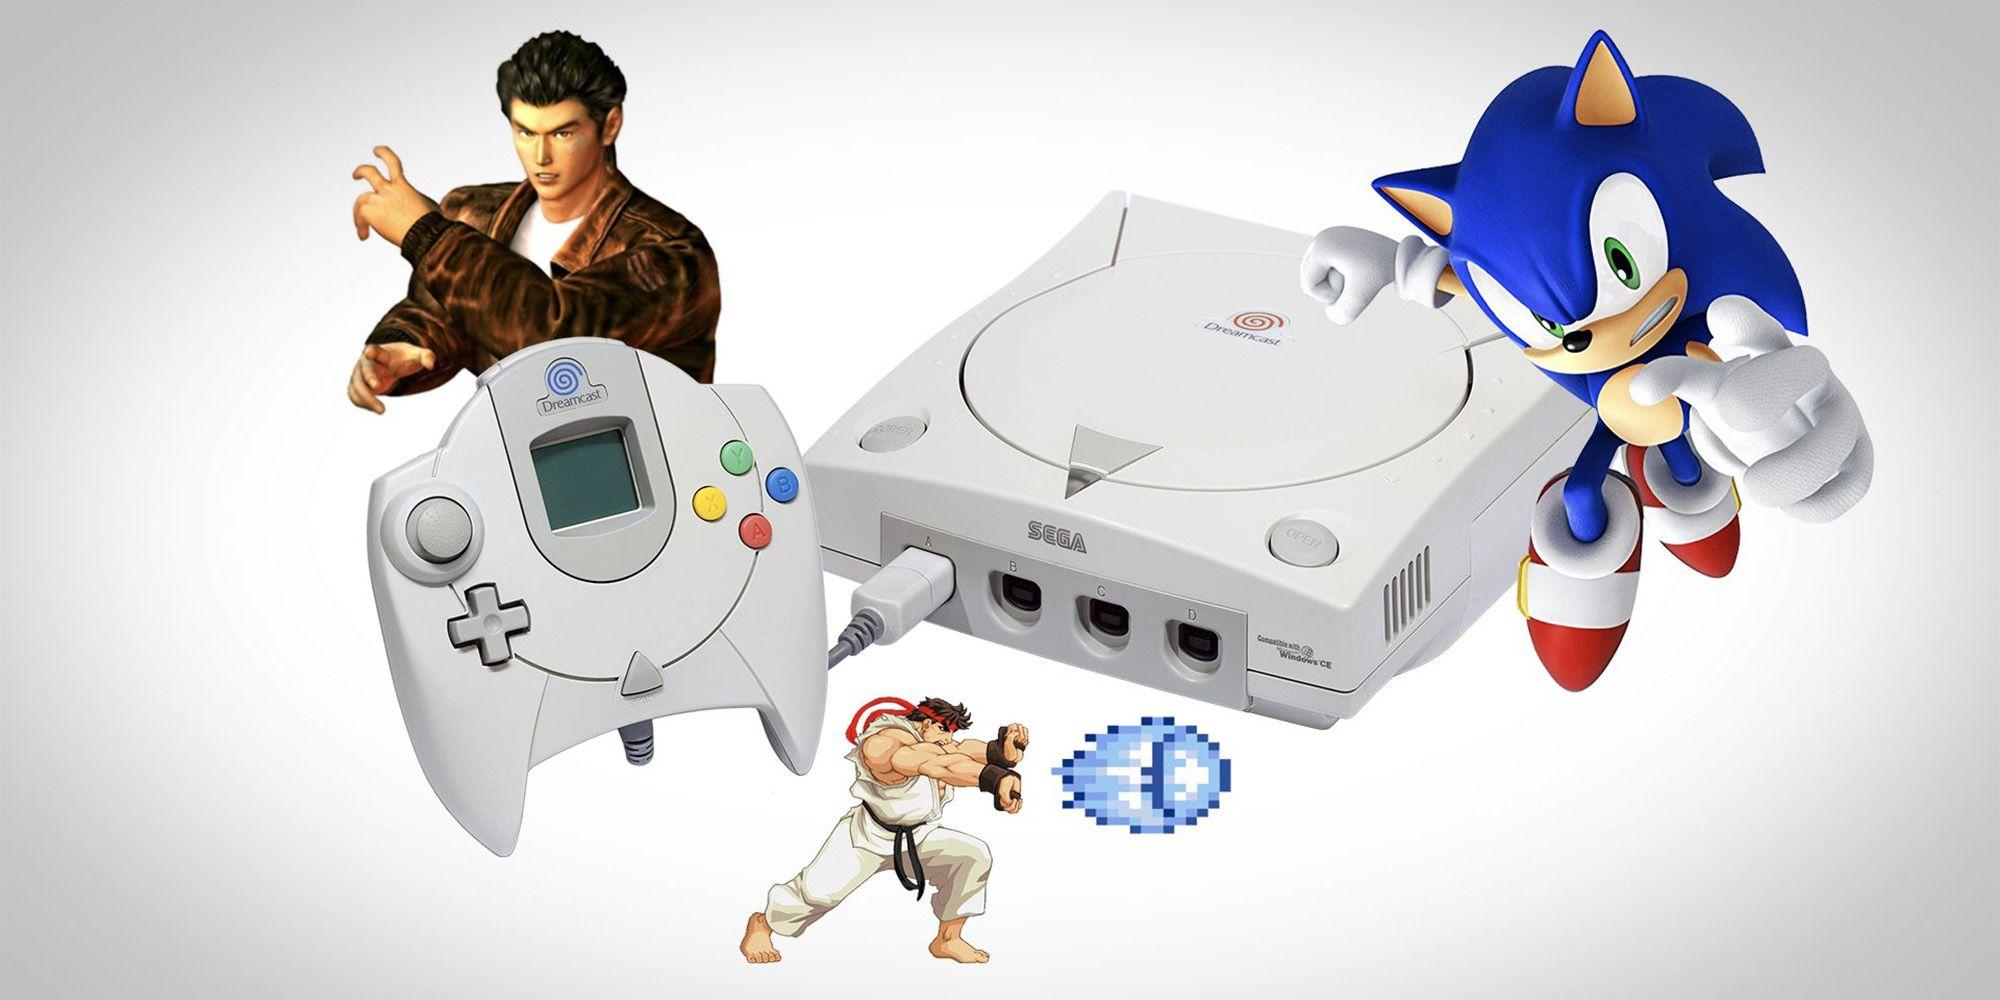 How the Sega Dreamcast Revolutionized Gaming